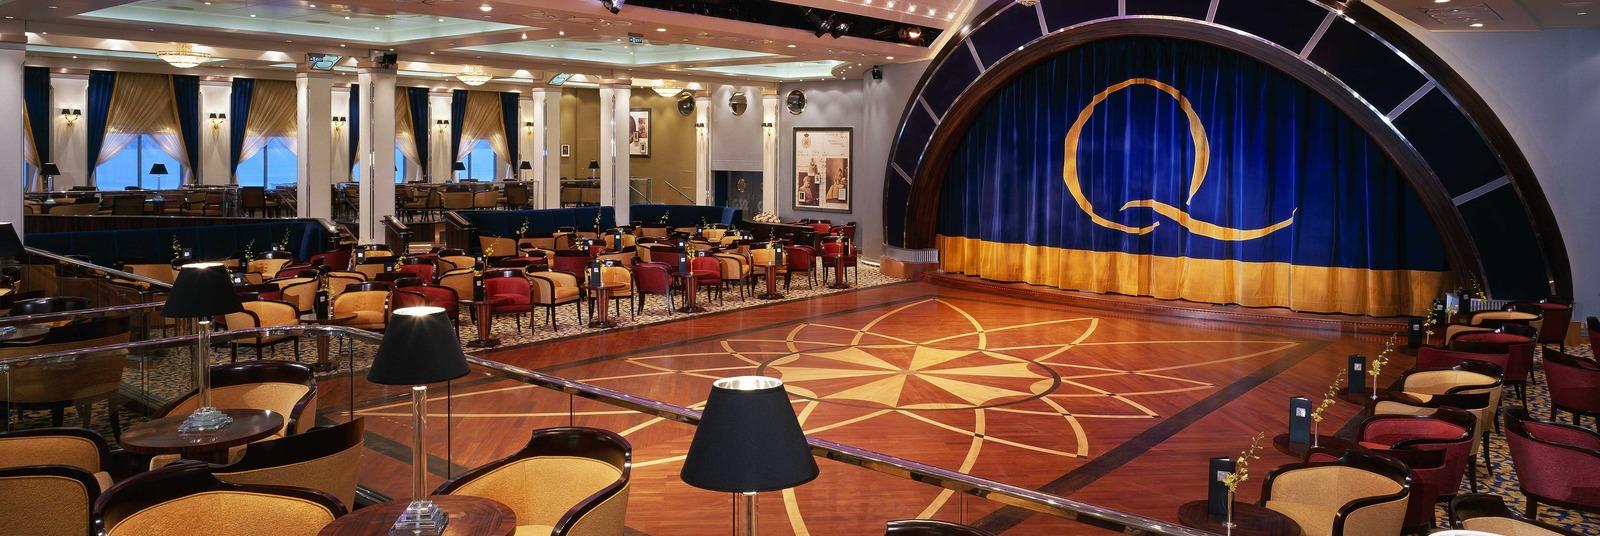 Homepage_large_qm2_queens_ballroom